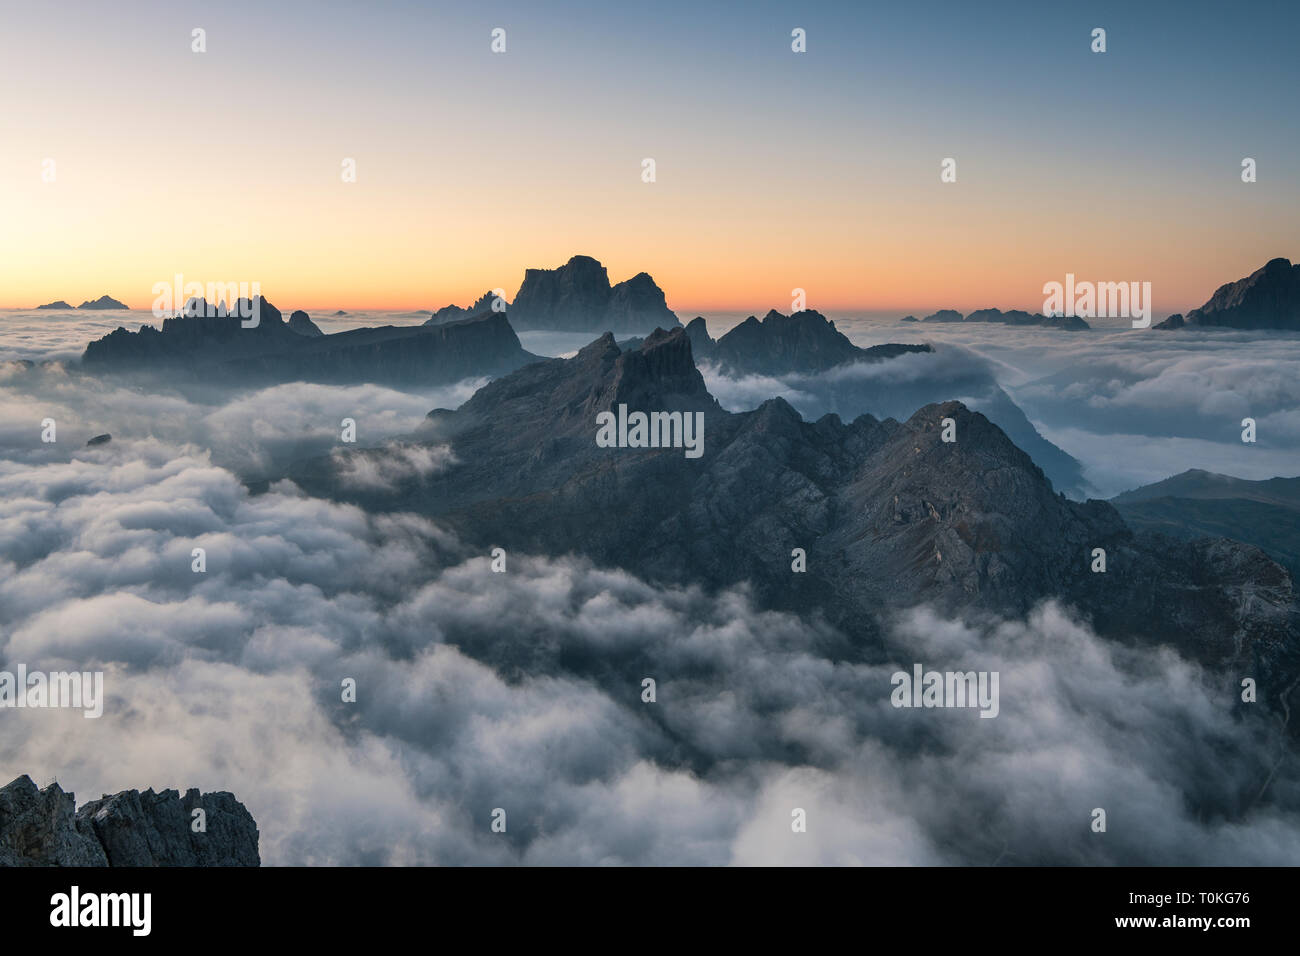 Vue depuis le Rifugio Lagazuoi (2752 m) à la Croda Negra, Croda da Lago et la Civetta, Dolomites, Italie Banque D'Images